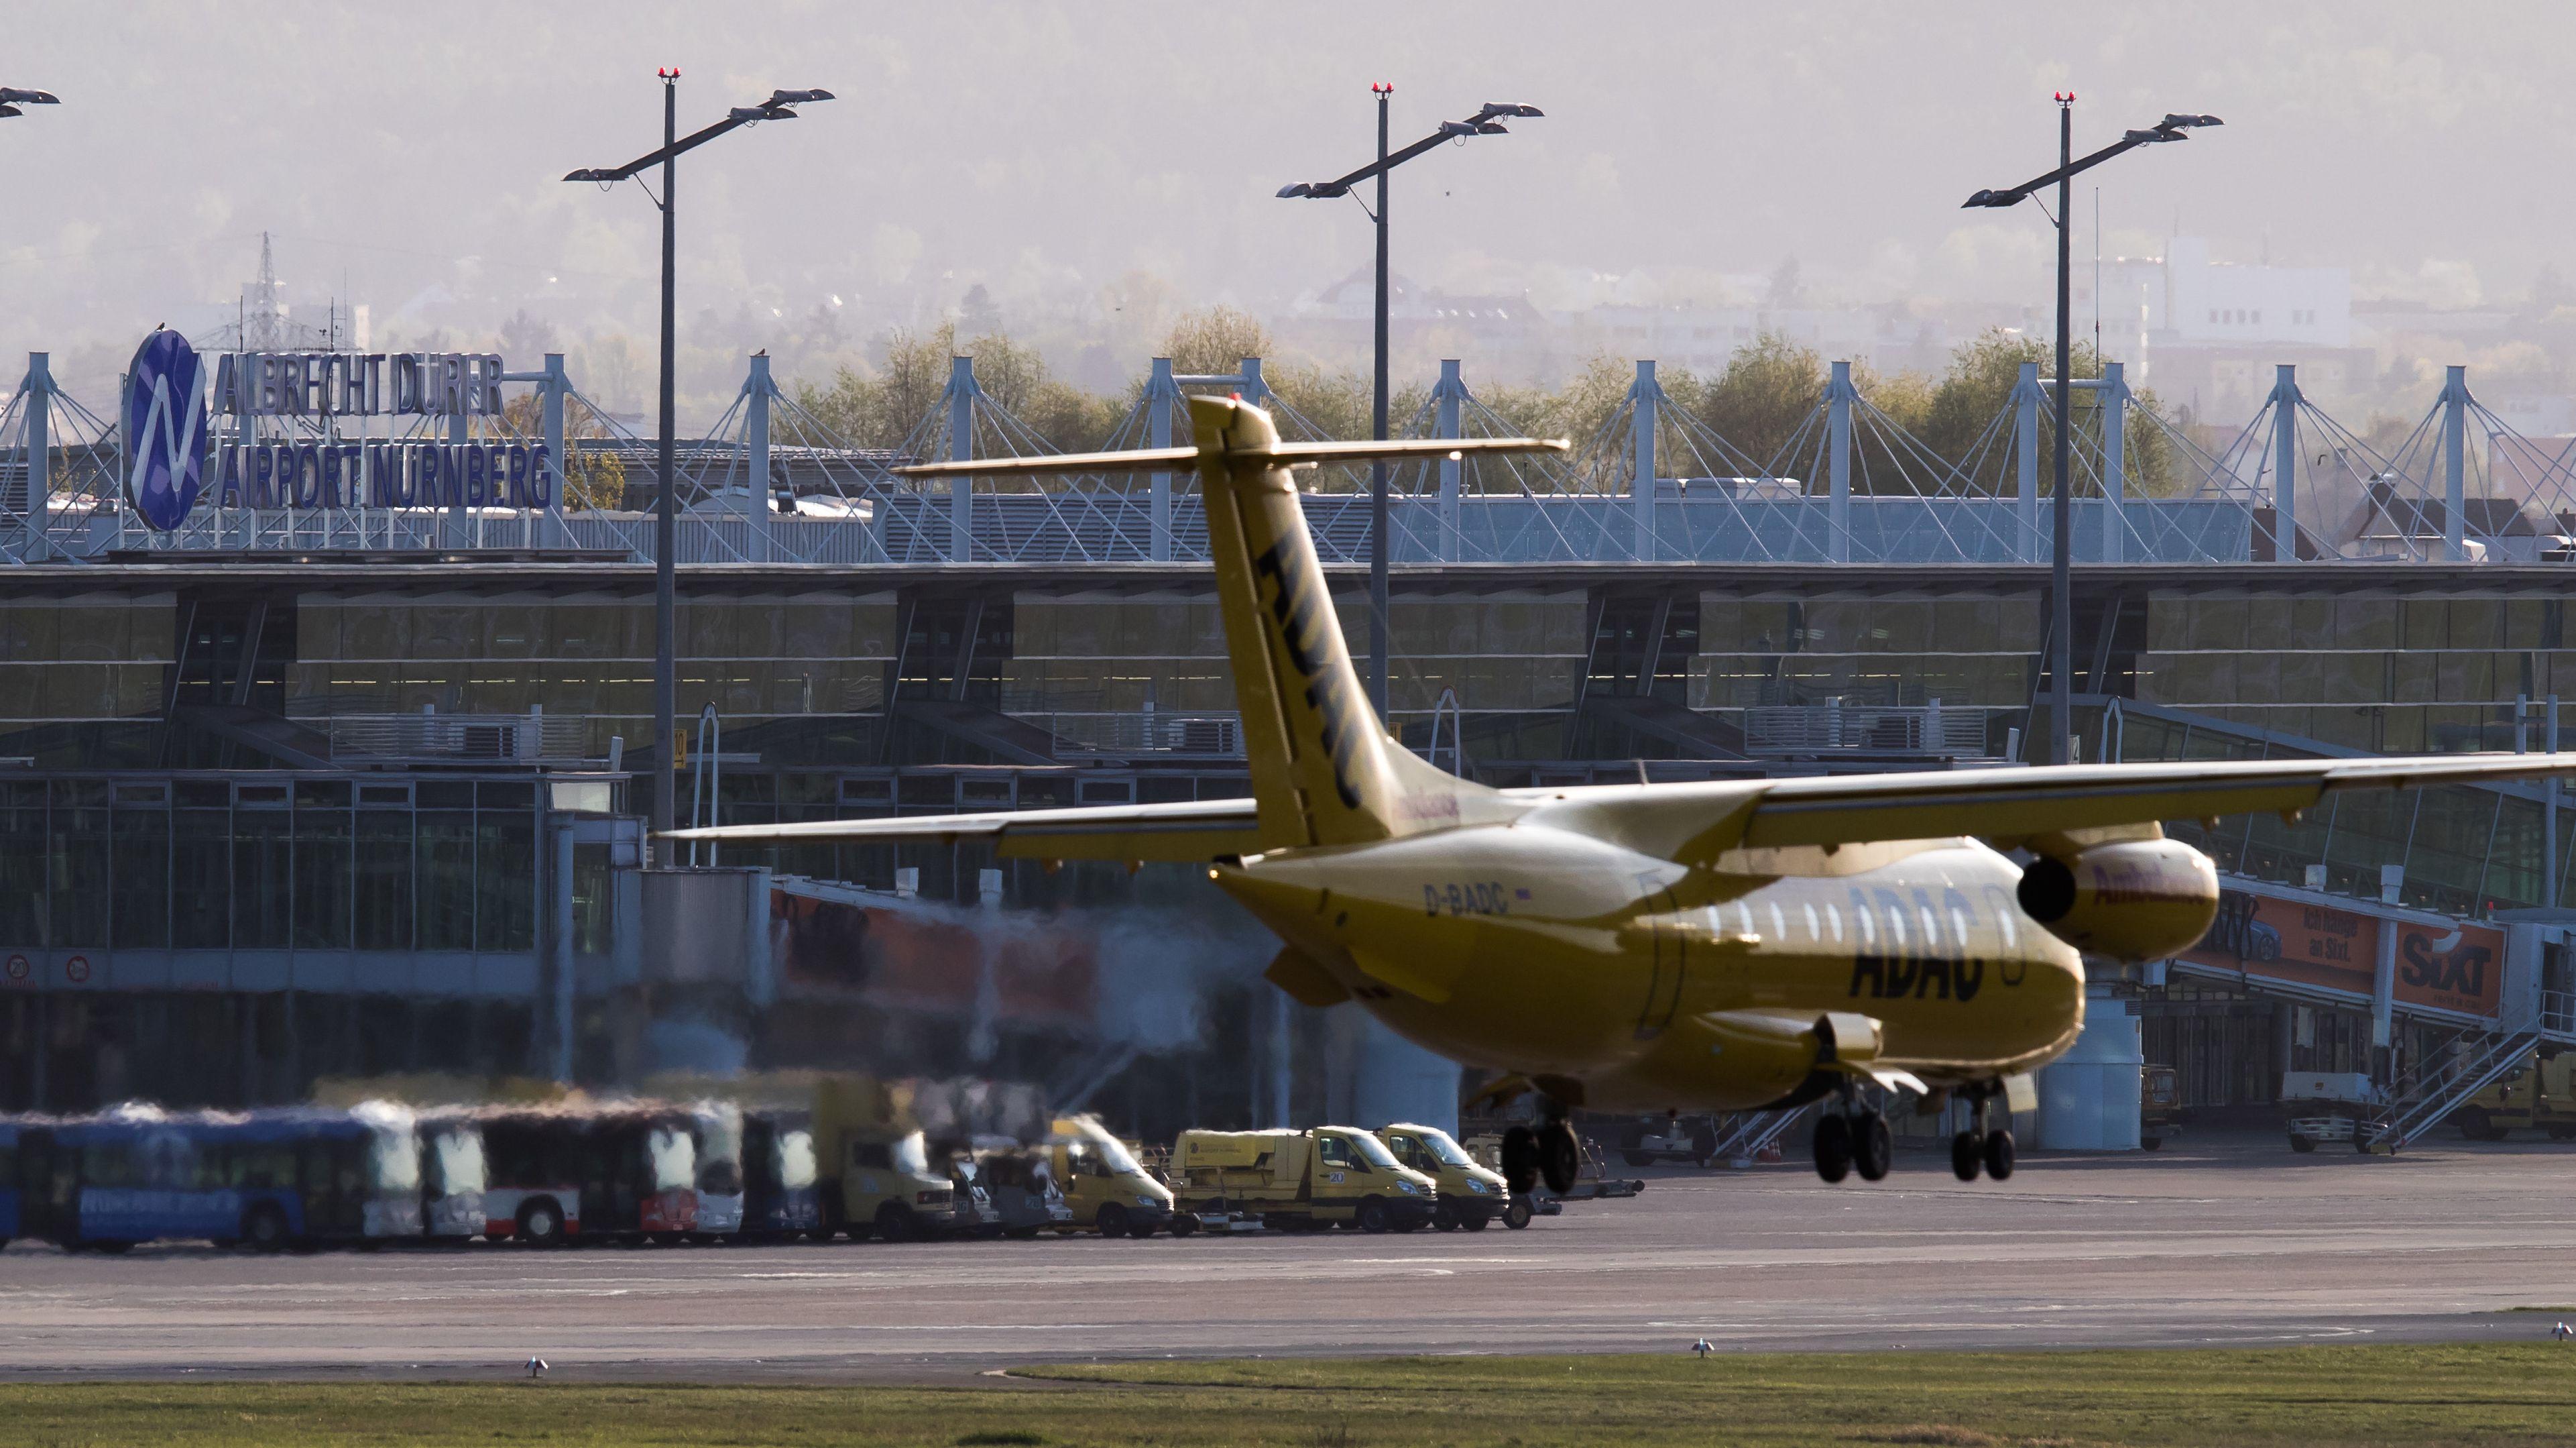 Nürnberger Flughafen